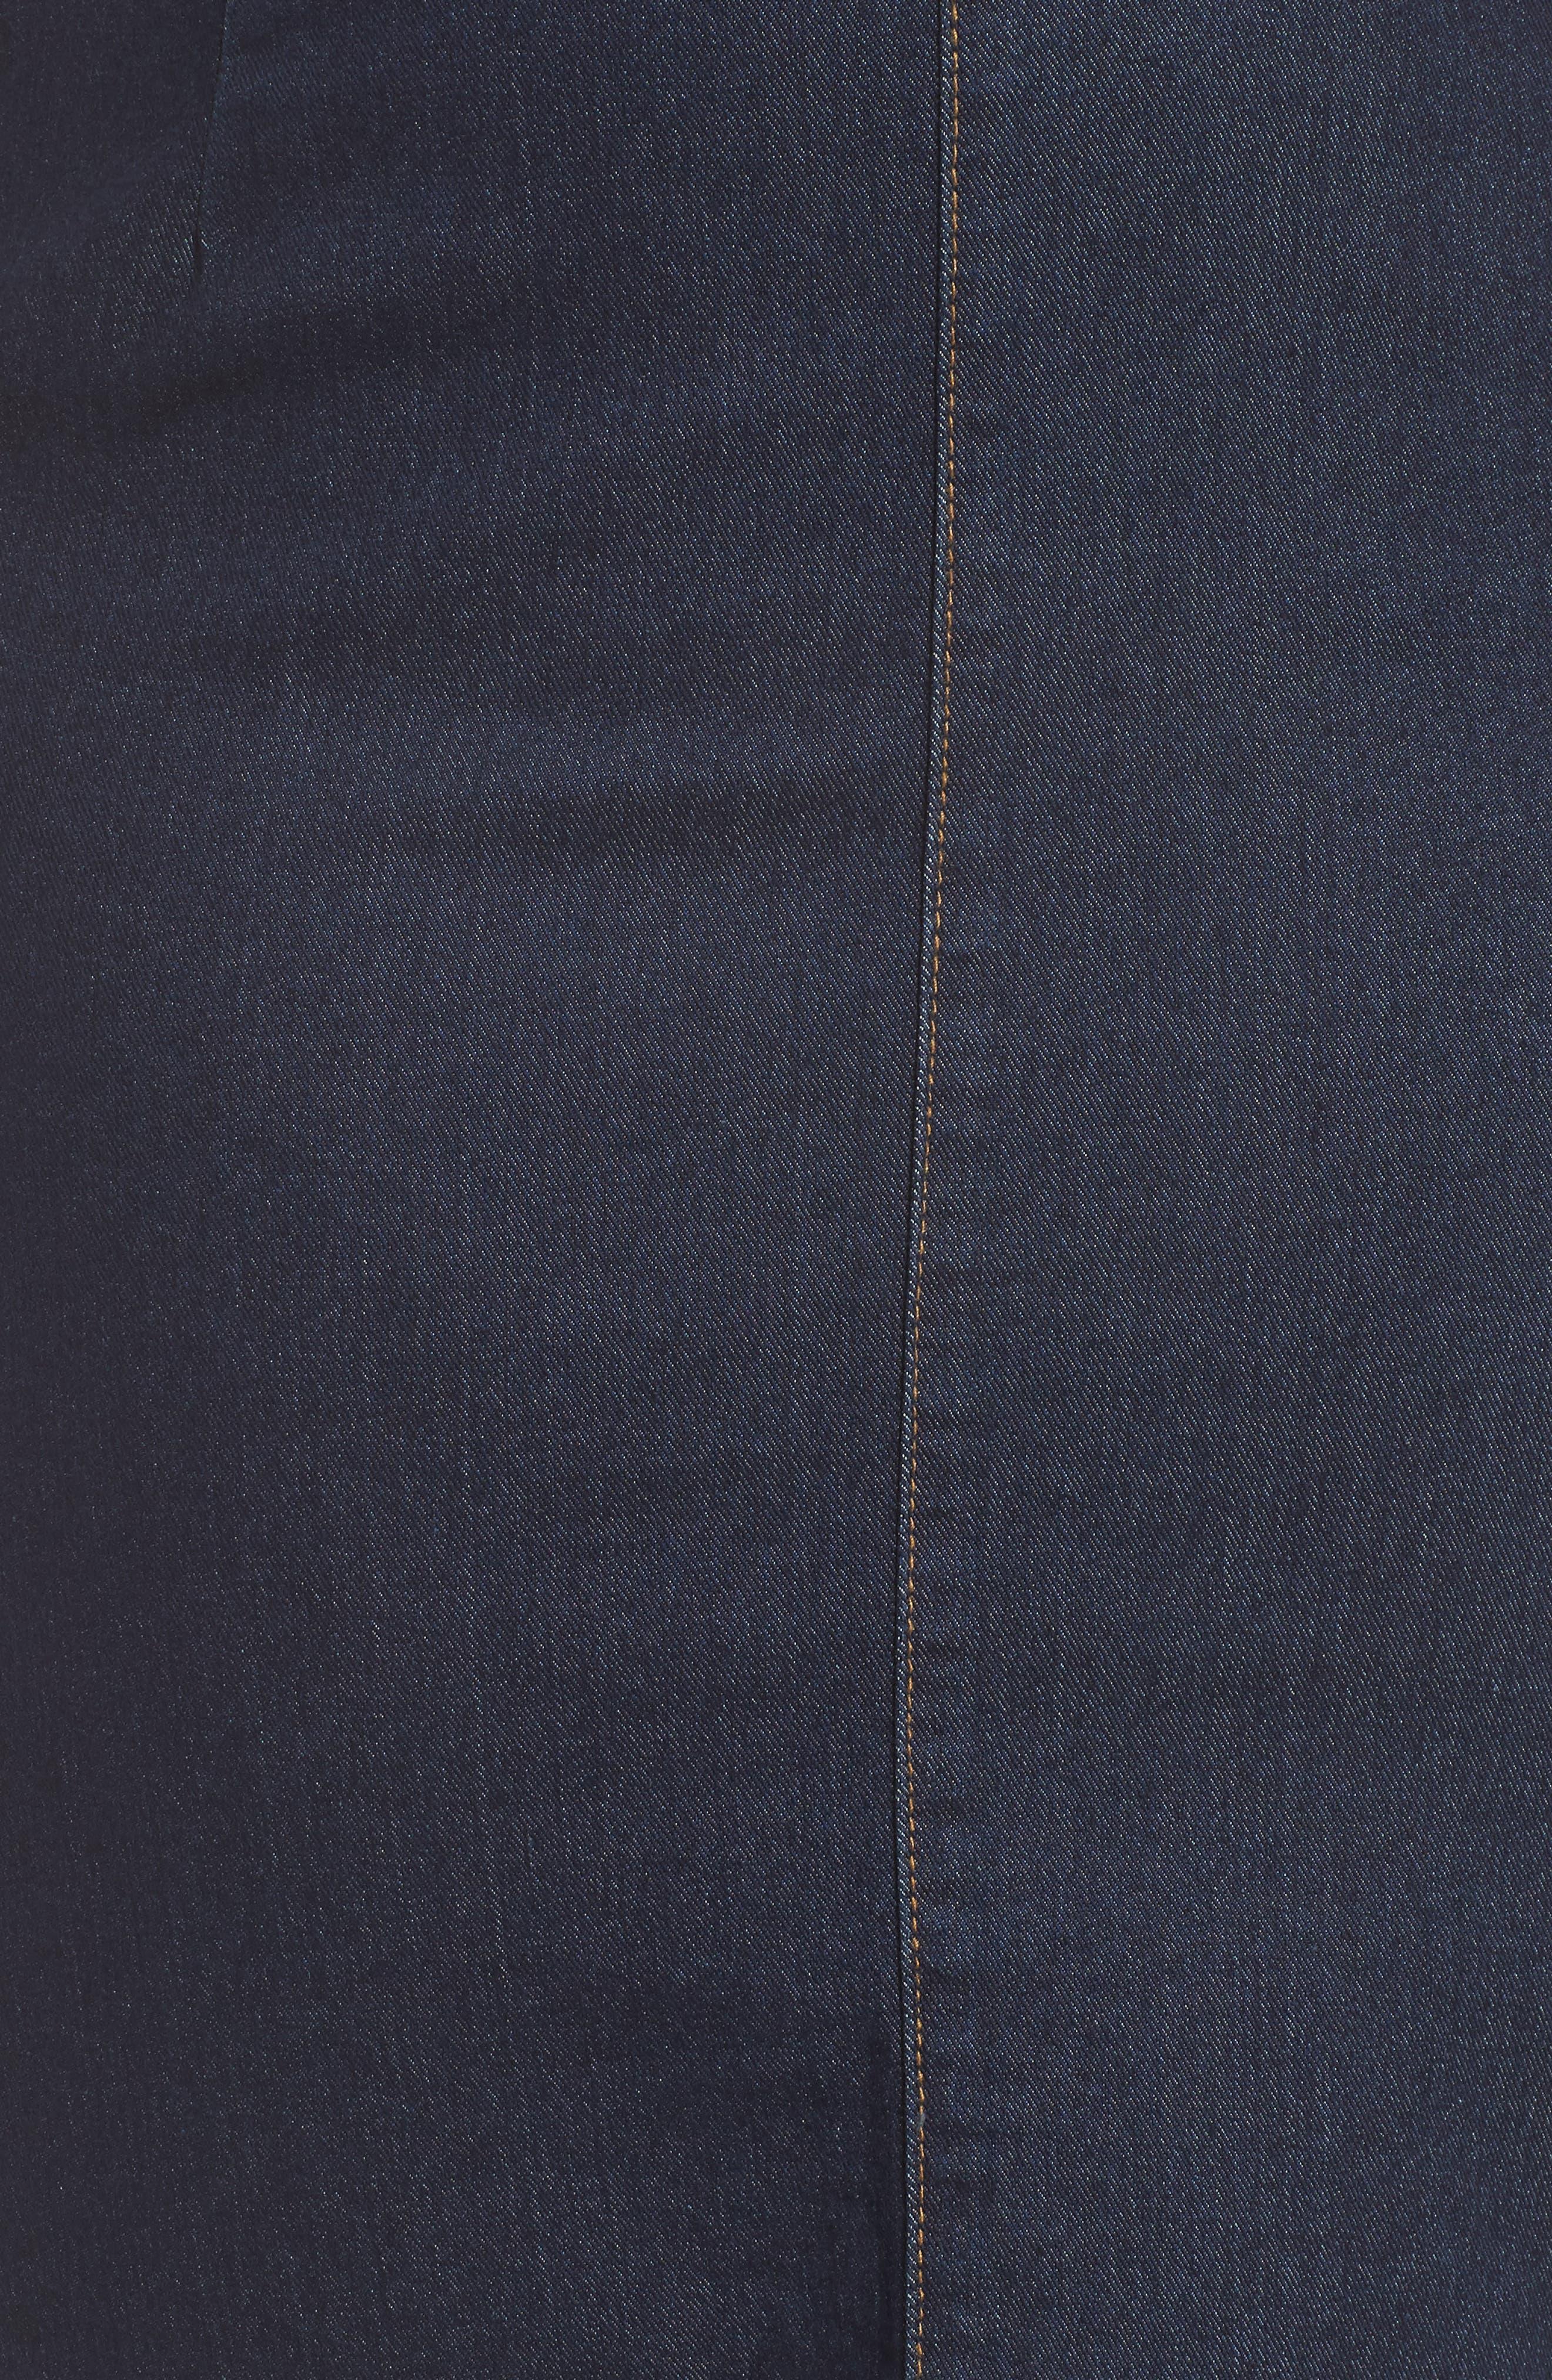 Denim Pencil Skirt,                             Alternate thumbnail 5, color,                             DARK DENIM